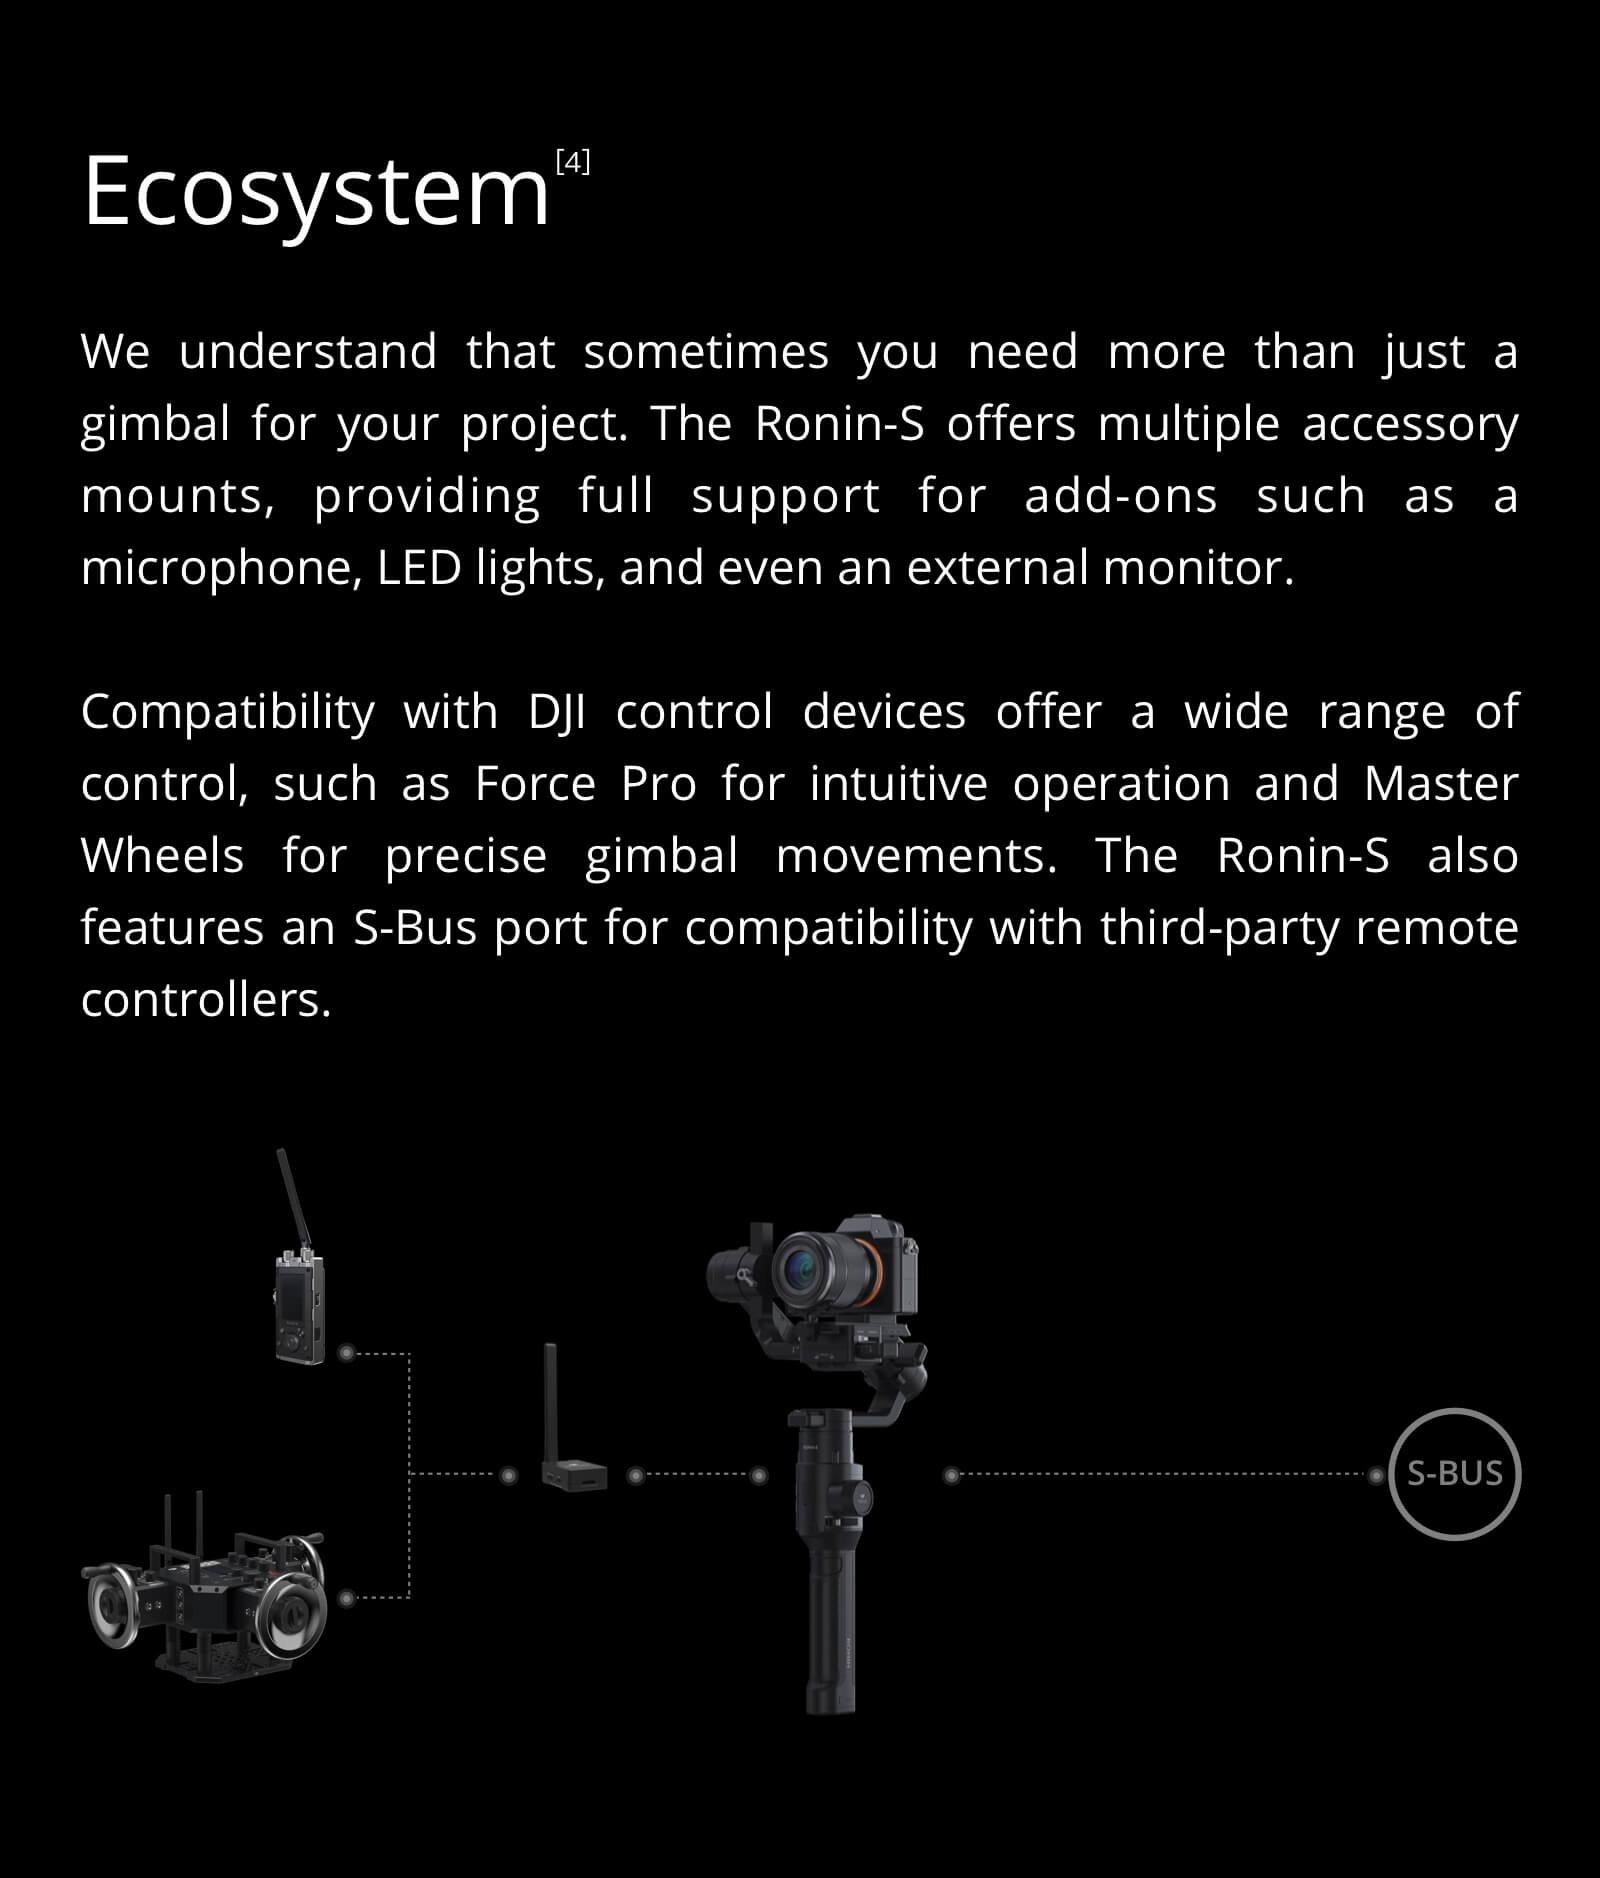 Ronin-S Ecosystem